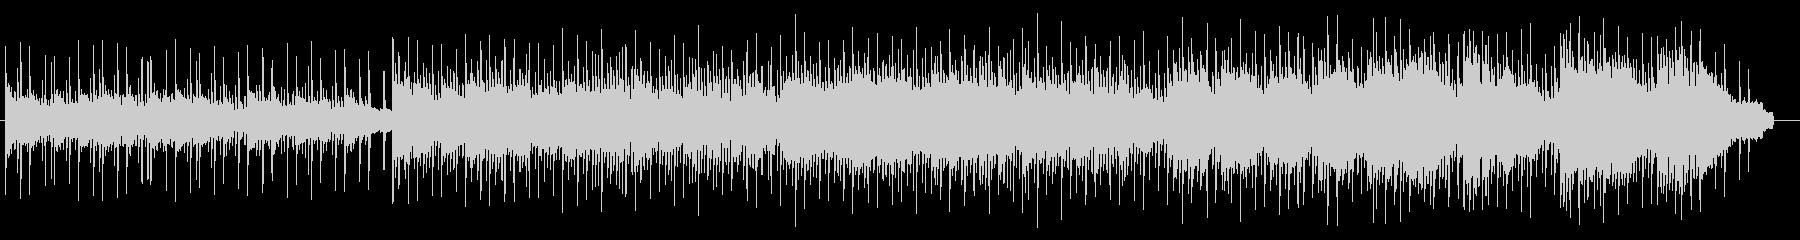 FM音源を使ったほんわかバラードの未再生の波形